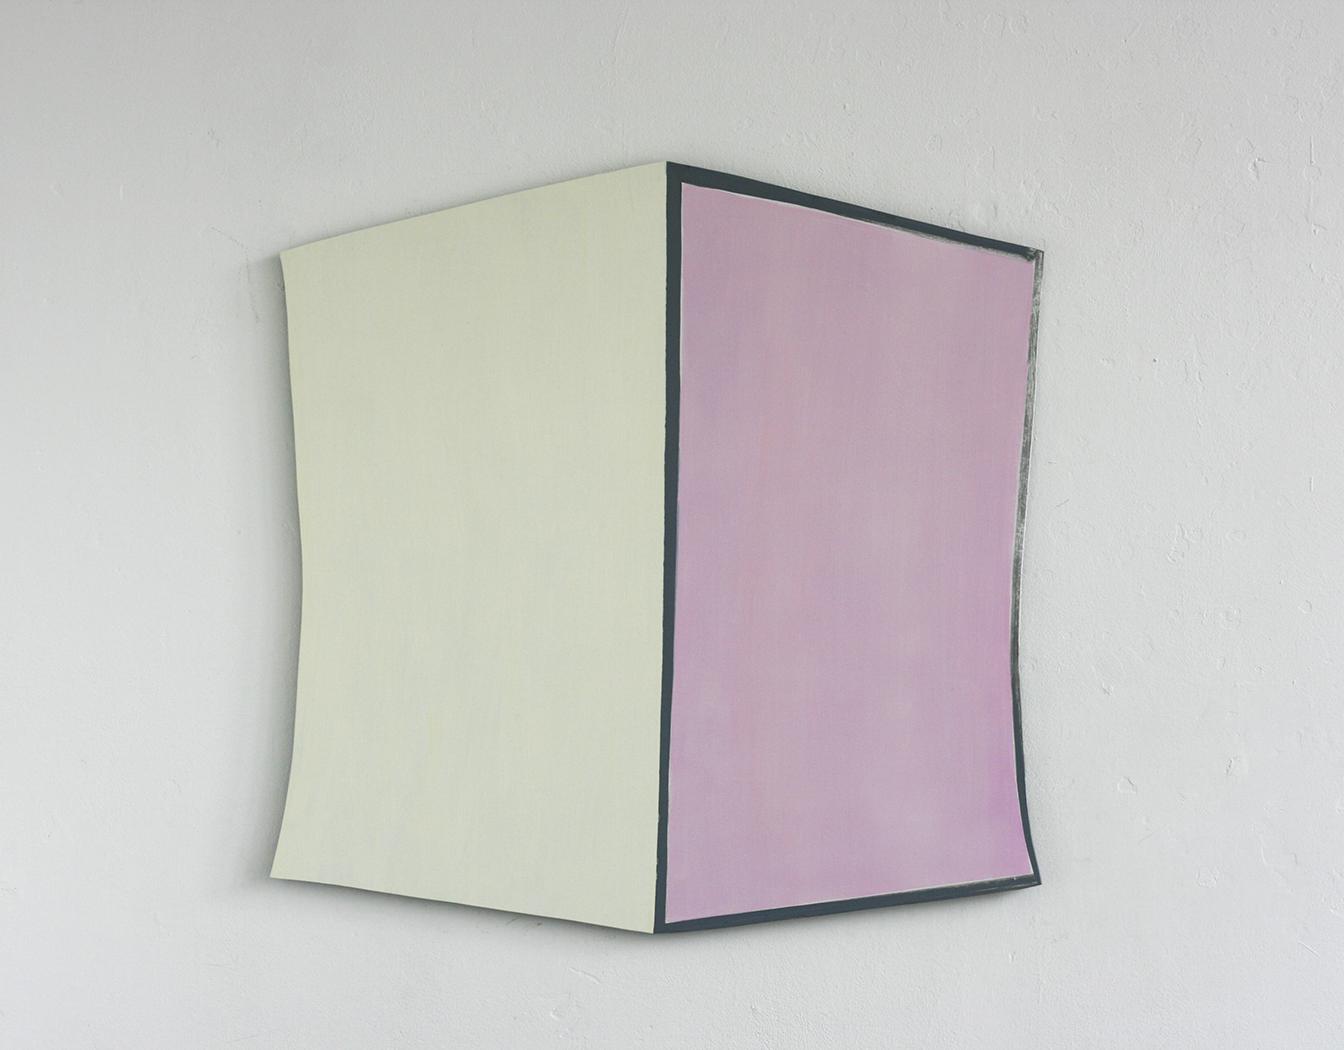 Marena Seeling 2018 untitled 80x79cm oilpaint on panel